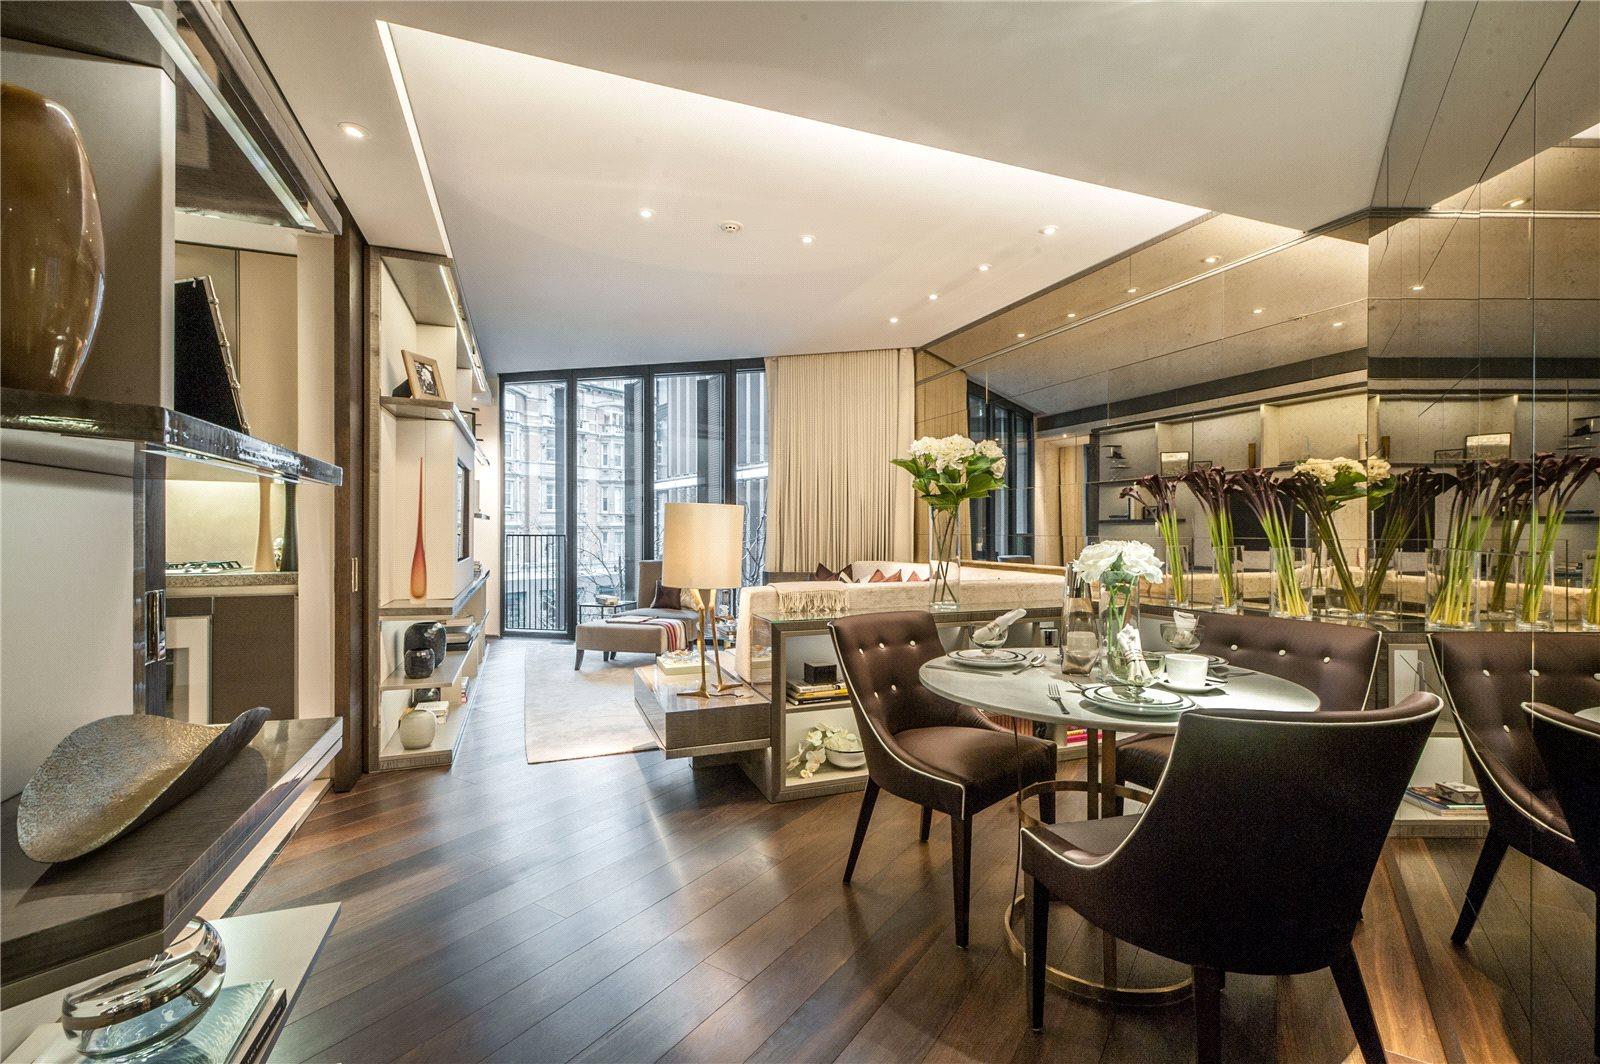 Apartments / Residences for Sale at Knightsbridge, London, SW1X London, England